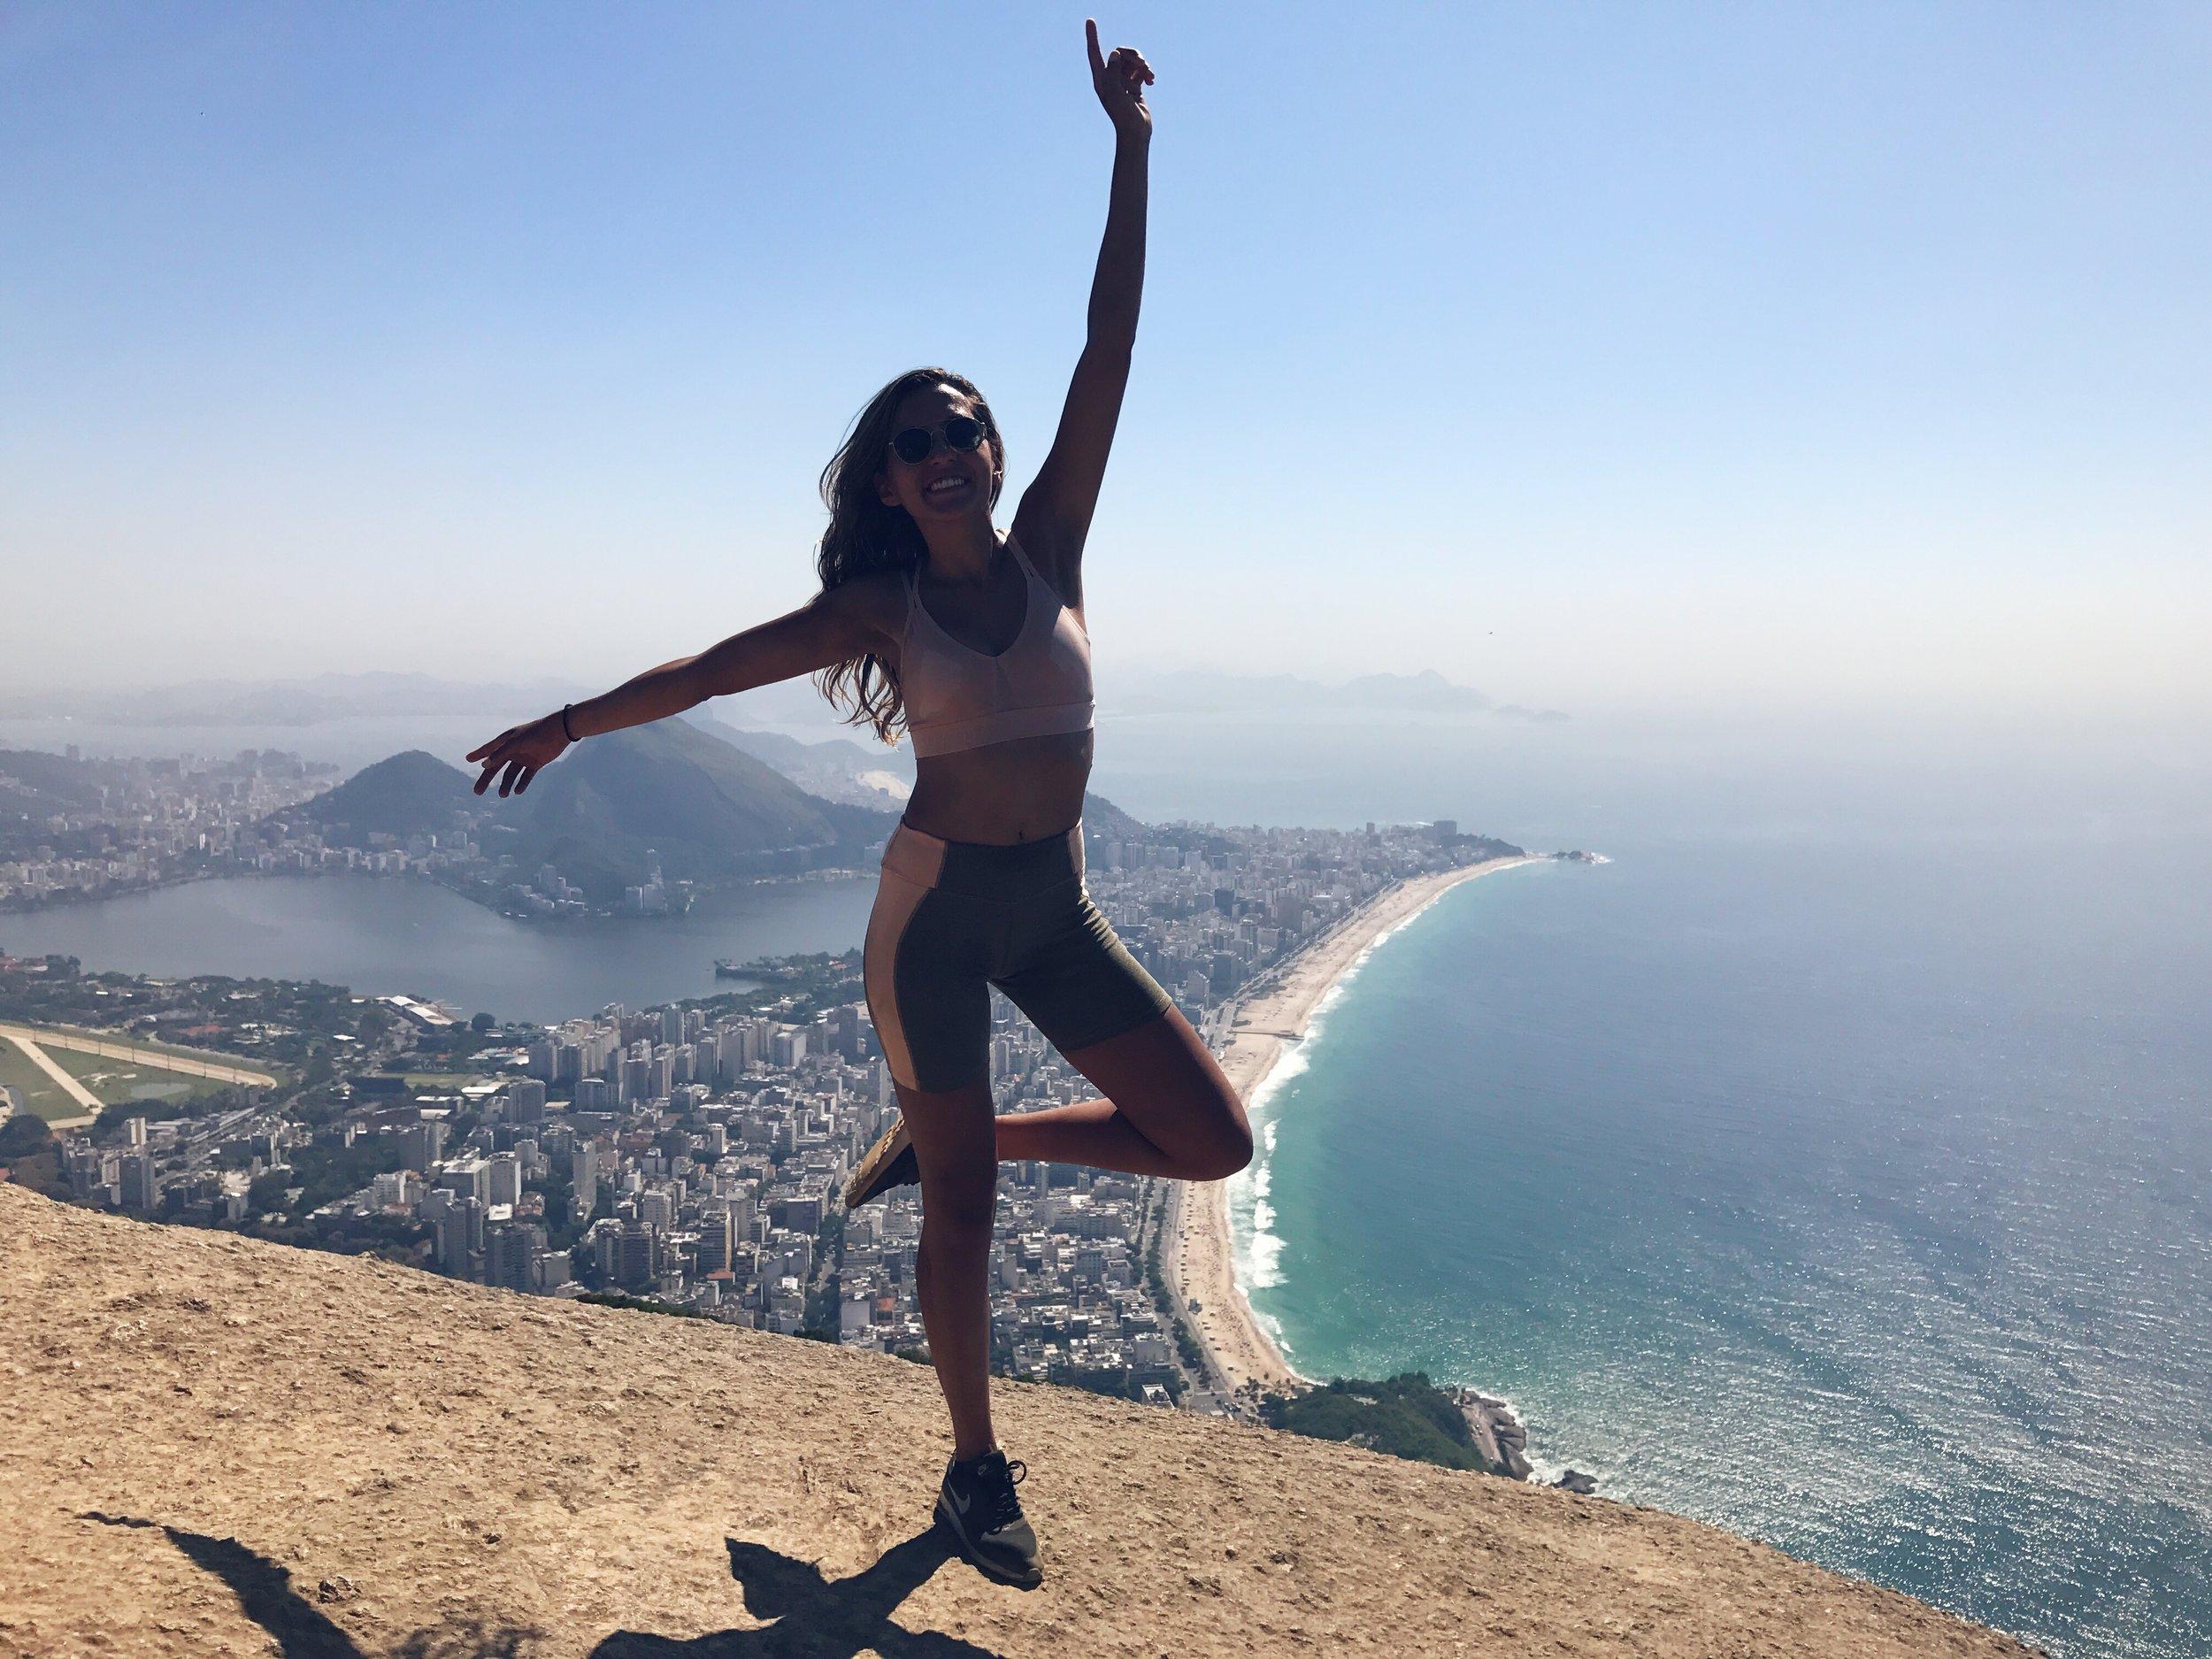 fashion-blogger-raquel-paiva-travel-visit-rio-de-janeiro-best-of-rio